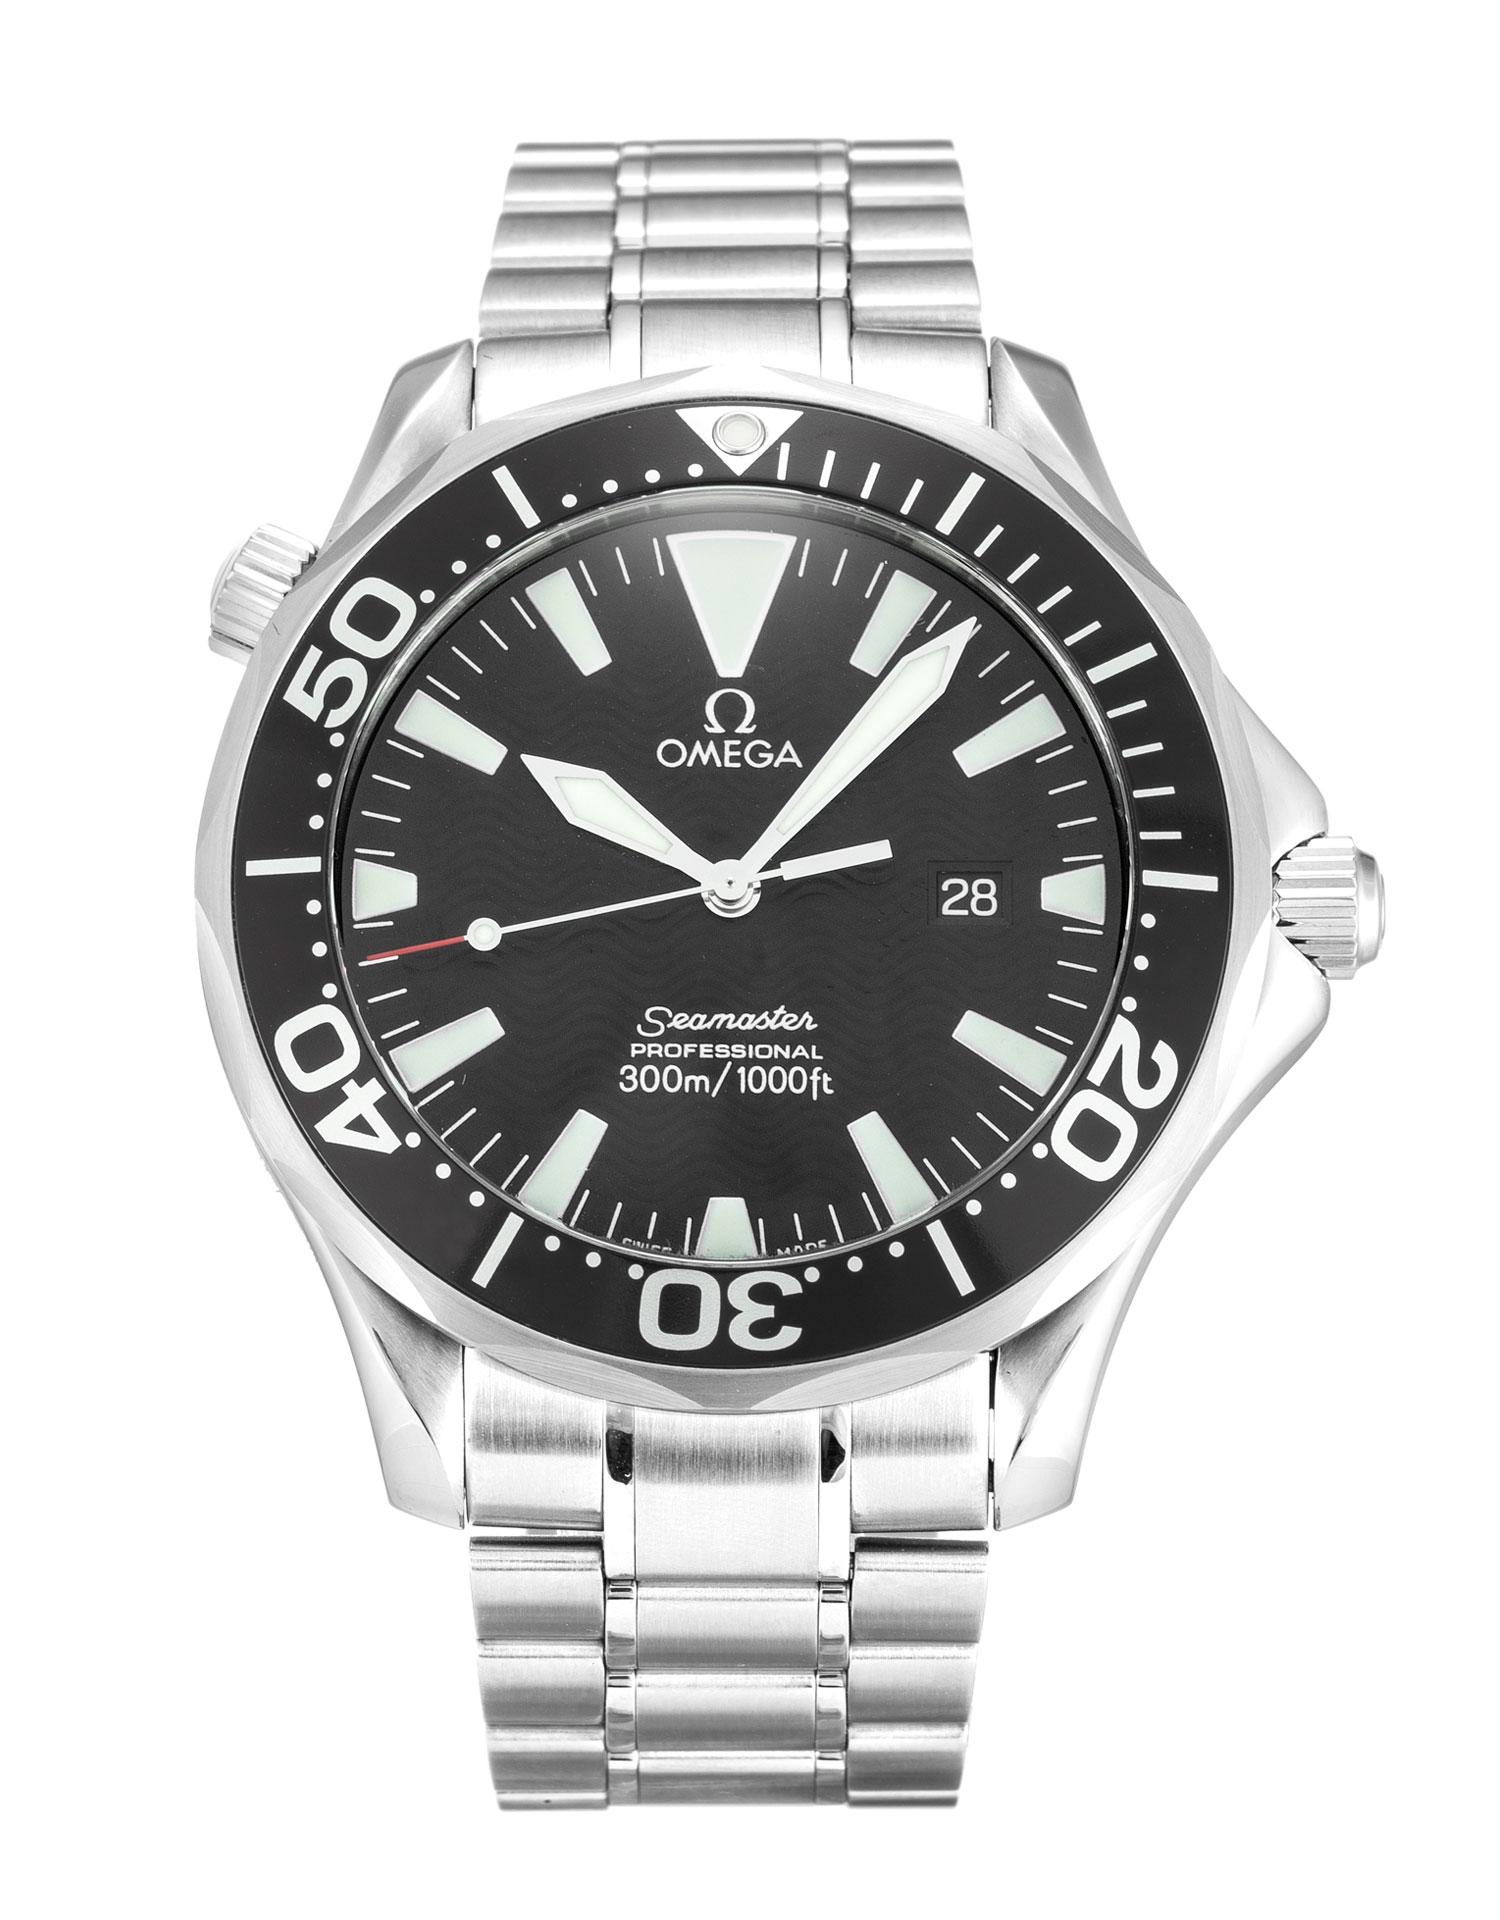 Omega Seamaster 300m 2264.50.00